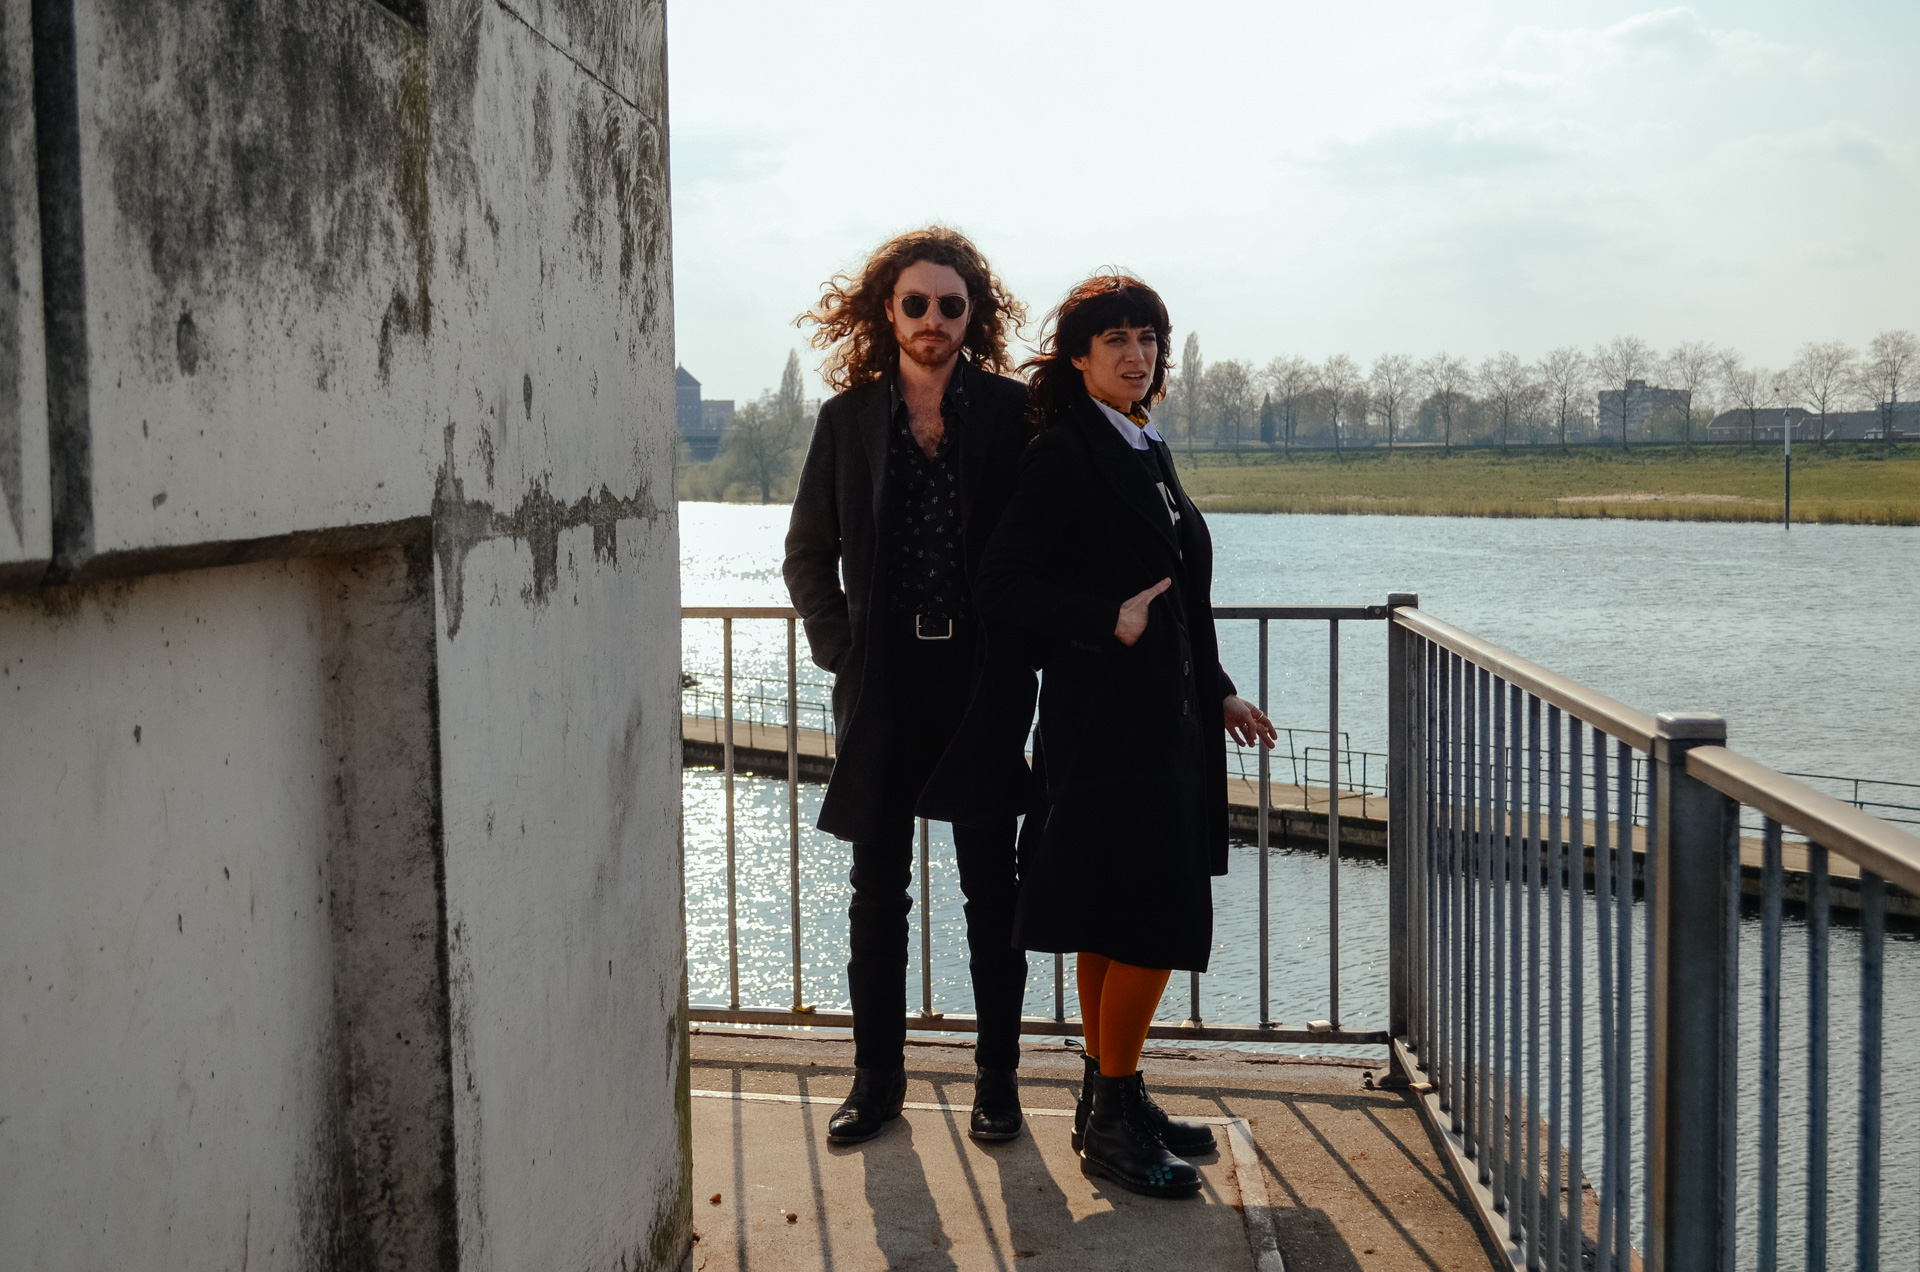 Davey Horne & Nicole Atkins (Photo by Matthijs van der Ven for The Influences)